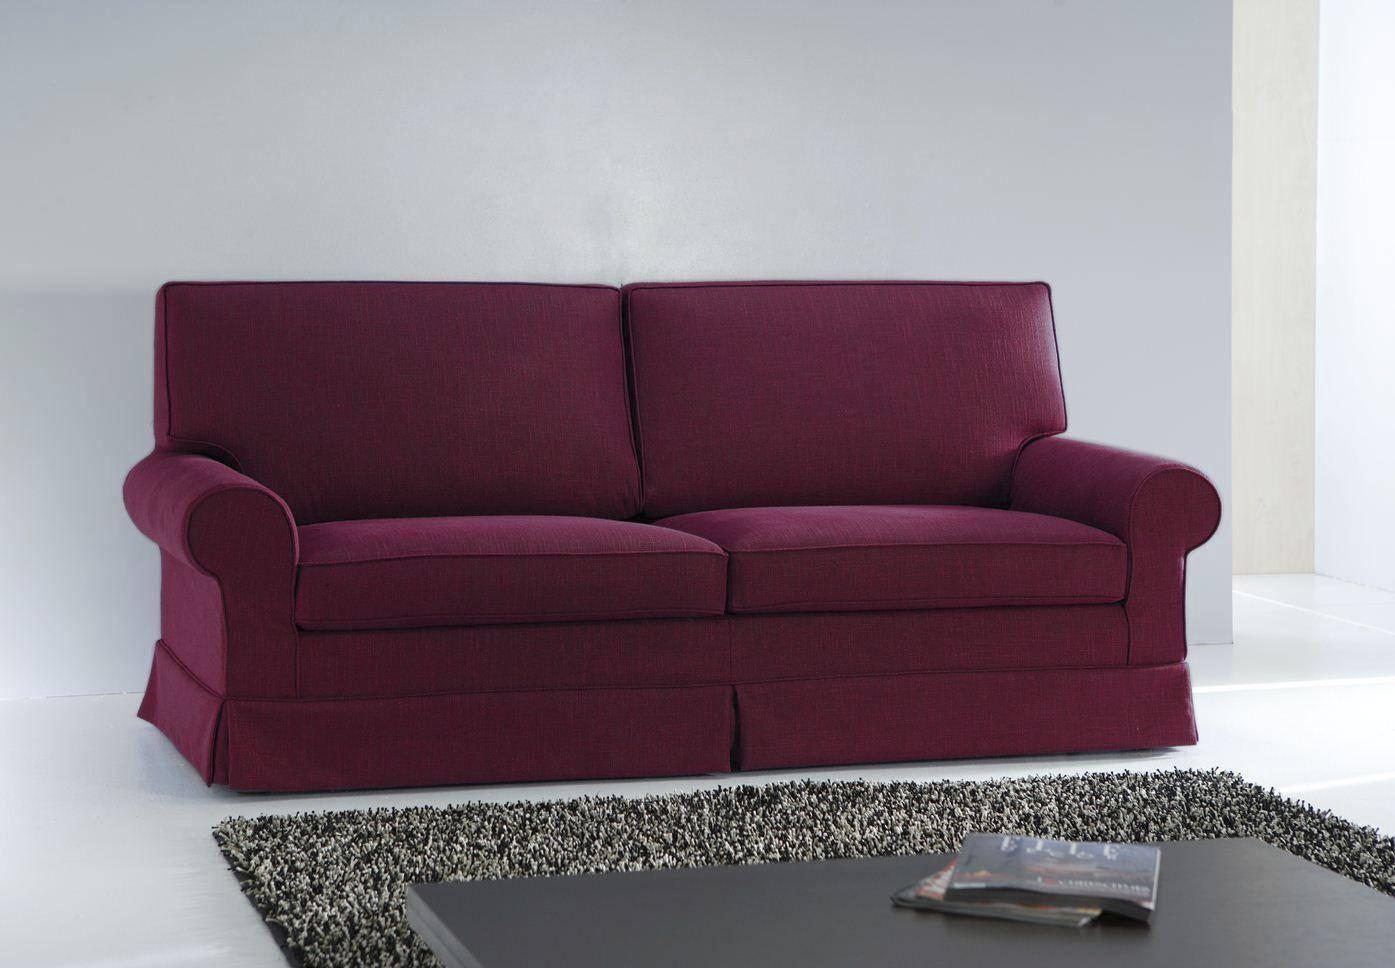 Big Lots Sofa | Decor References for Big Lots Sofa (Image 6 of 30)